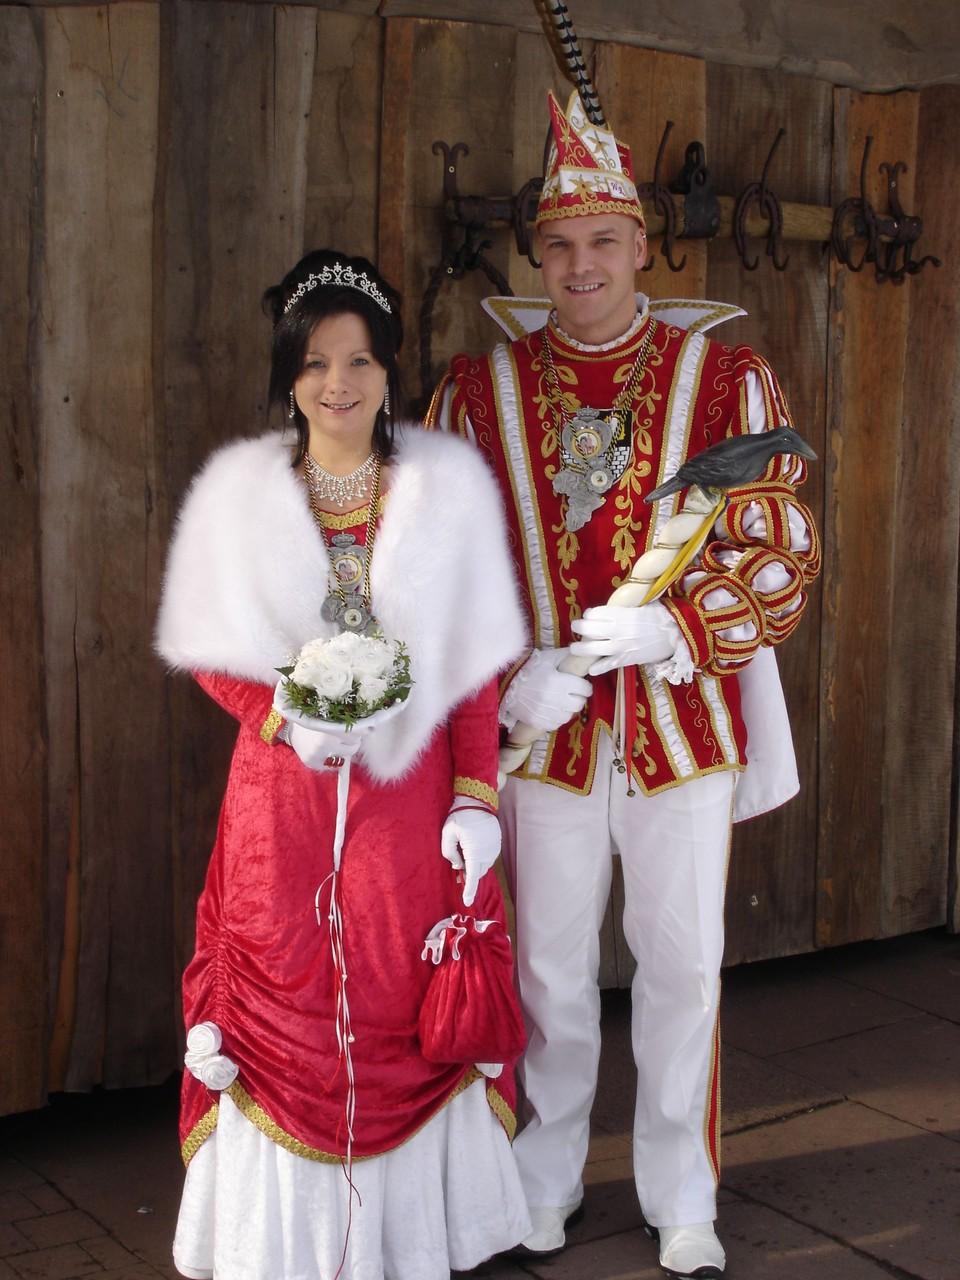 2009 - Prinz Wolfgang I. und Prinzessin Tina I.